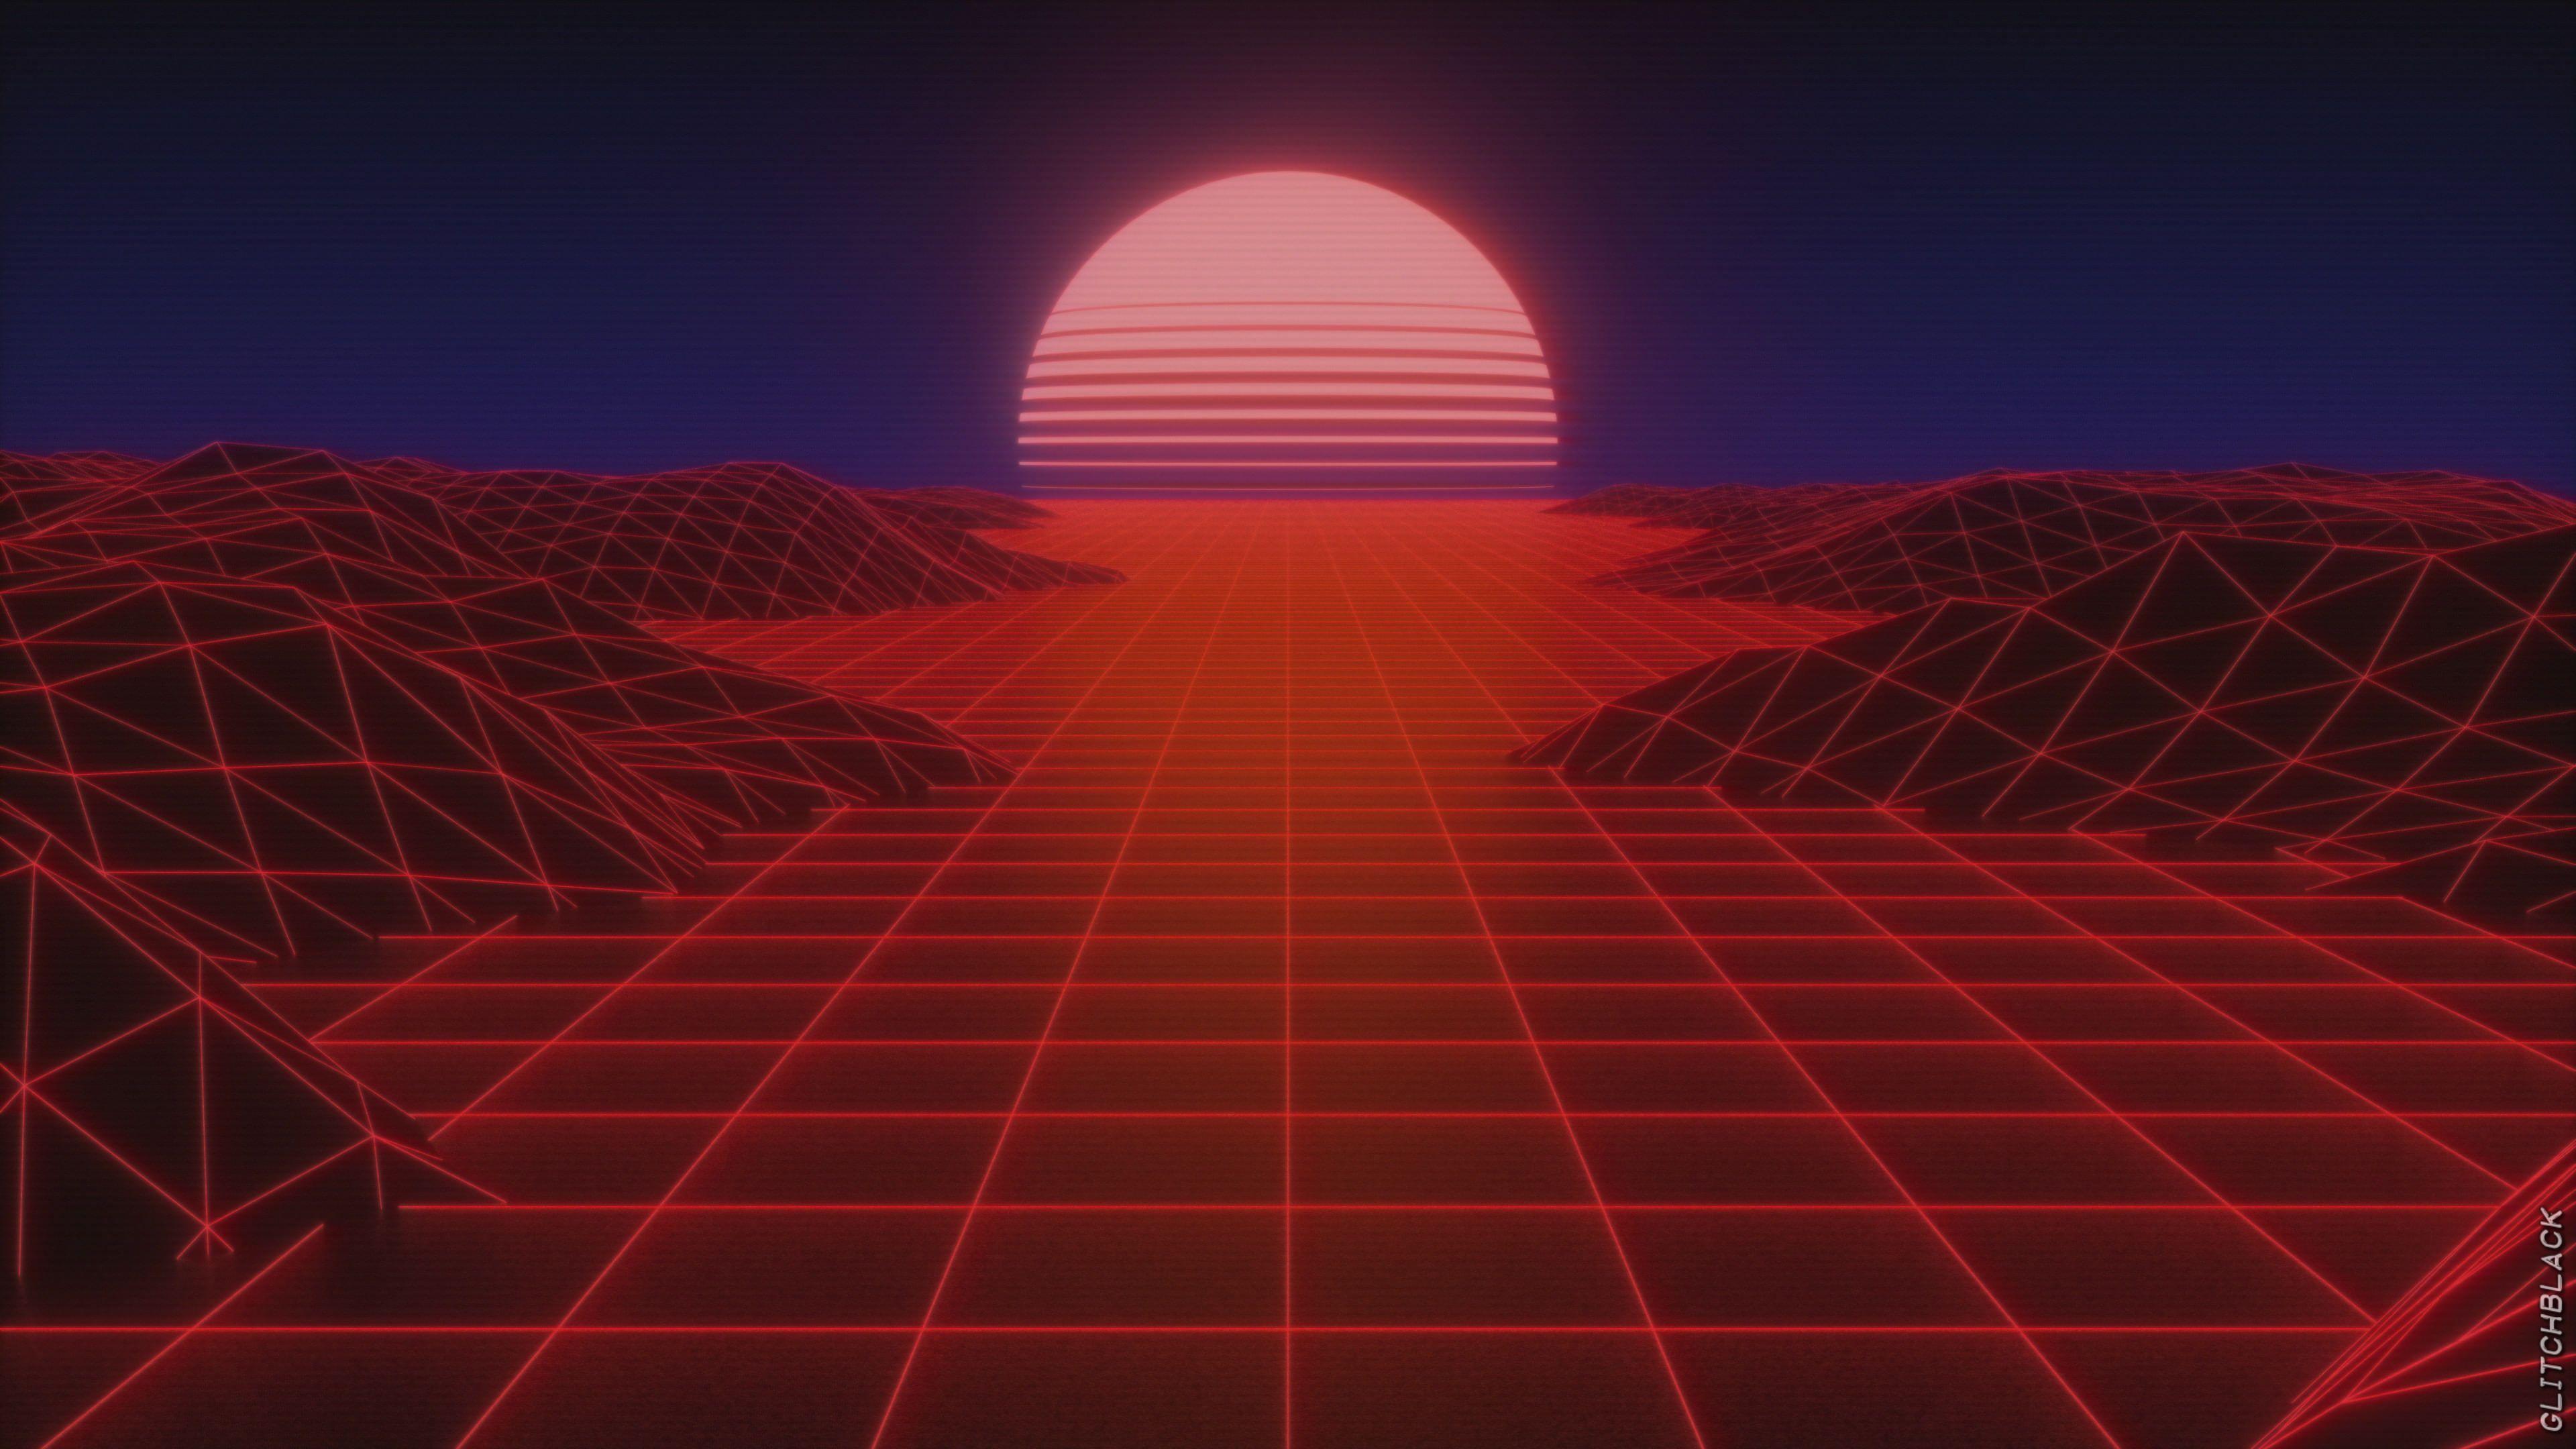 synthwave Sun vaporwave 4K wallpaper hdwallpaper